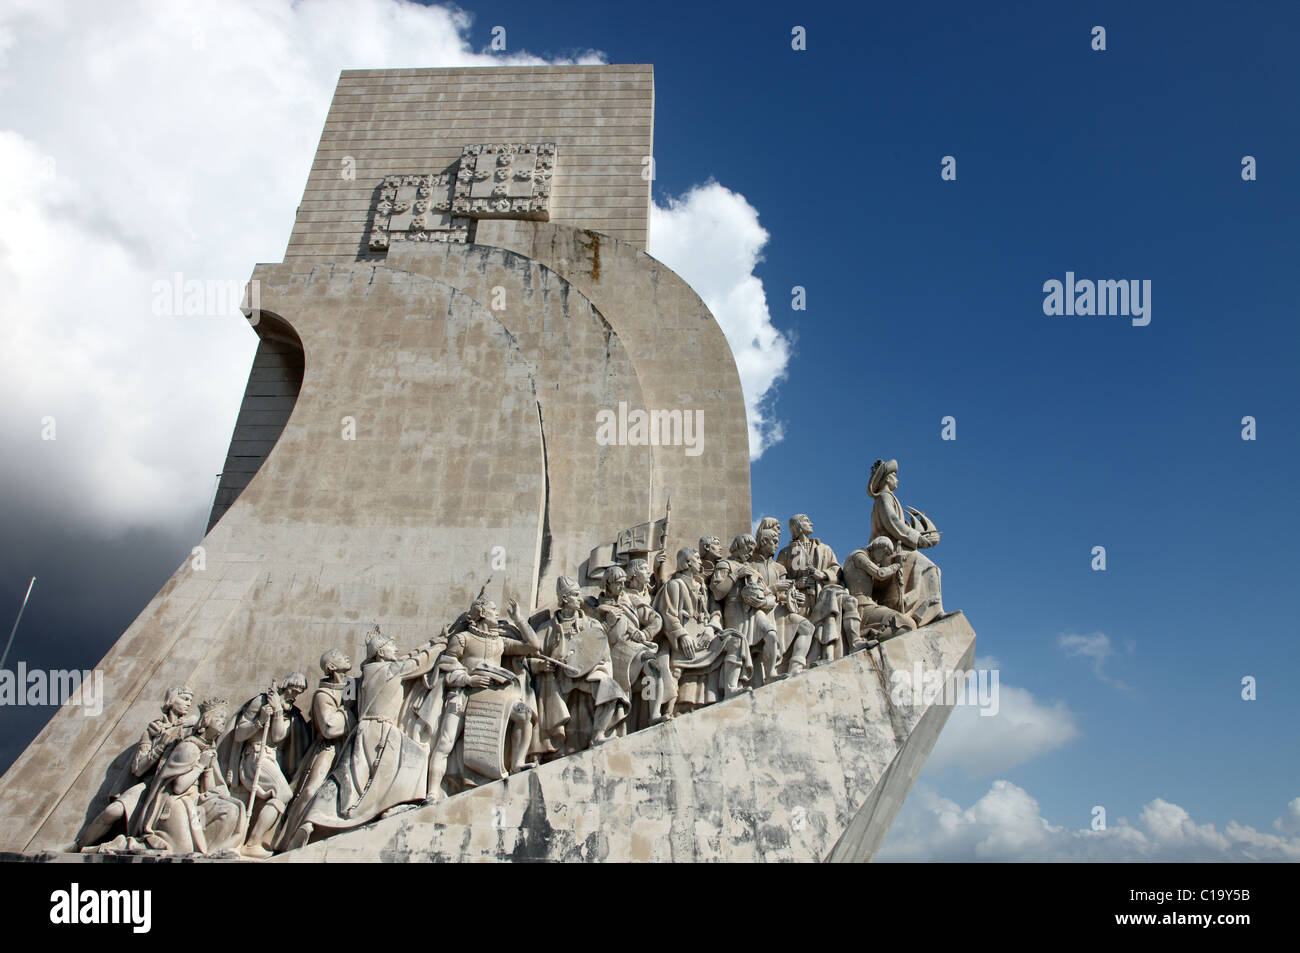 Monument to the Discoveries, Padrao dos Descobrimentos, Belem, Lisbon - Stock Image